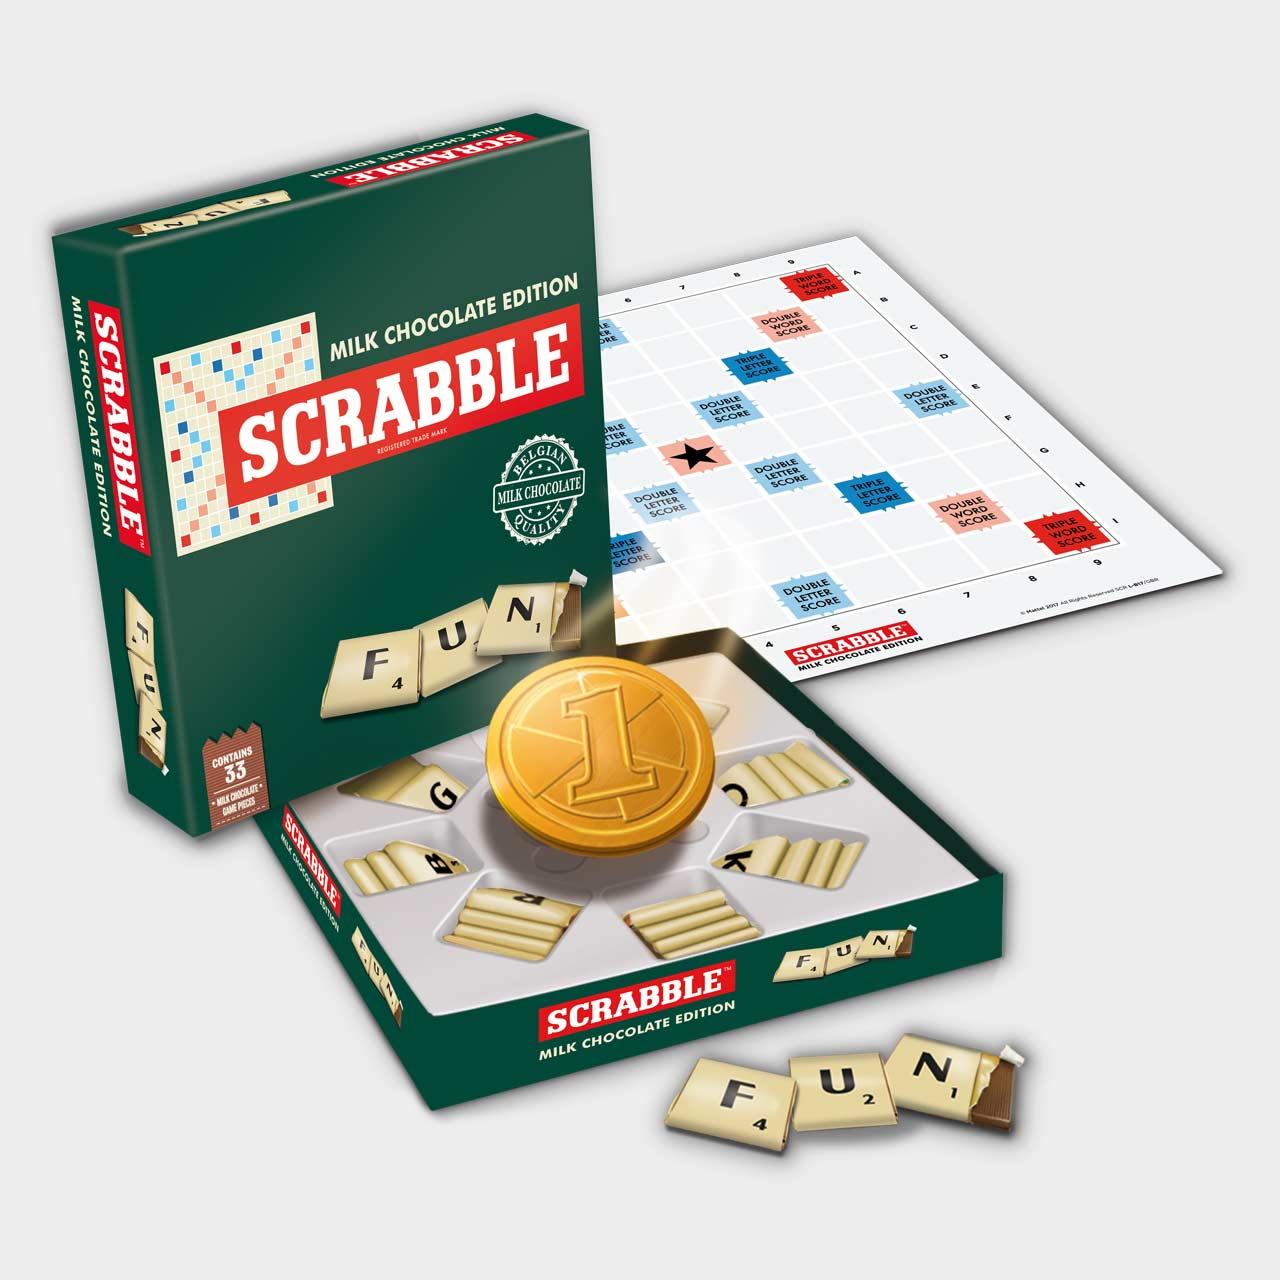 Scrabble Chocolate